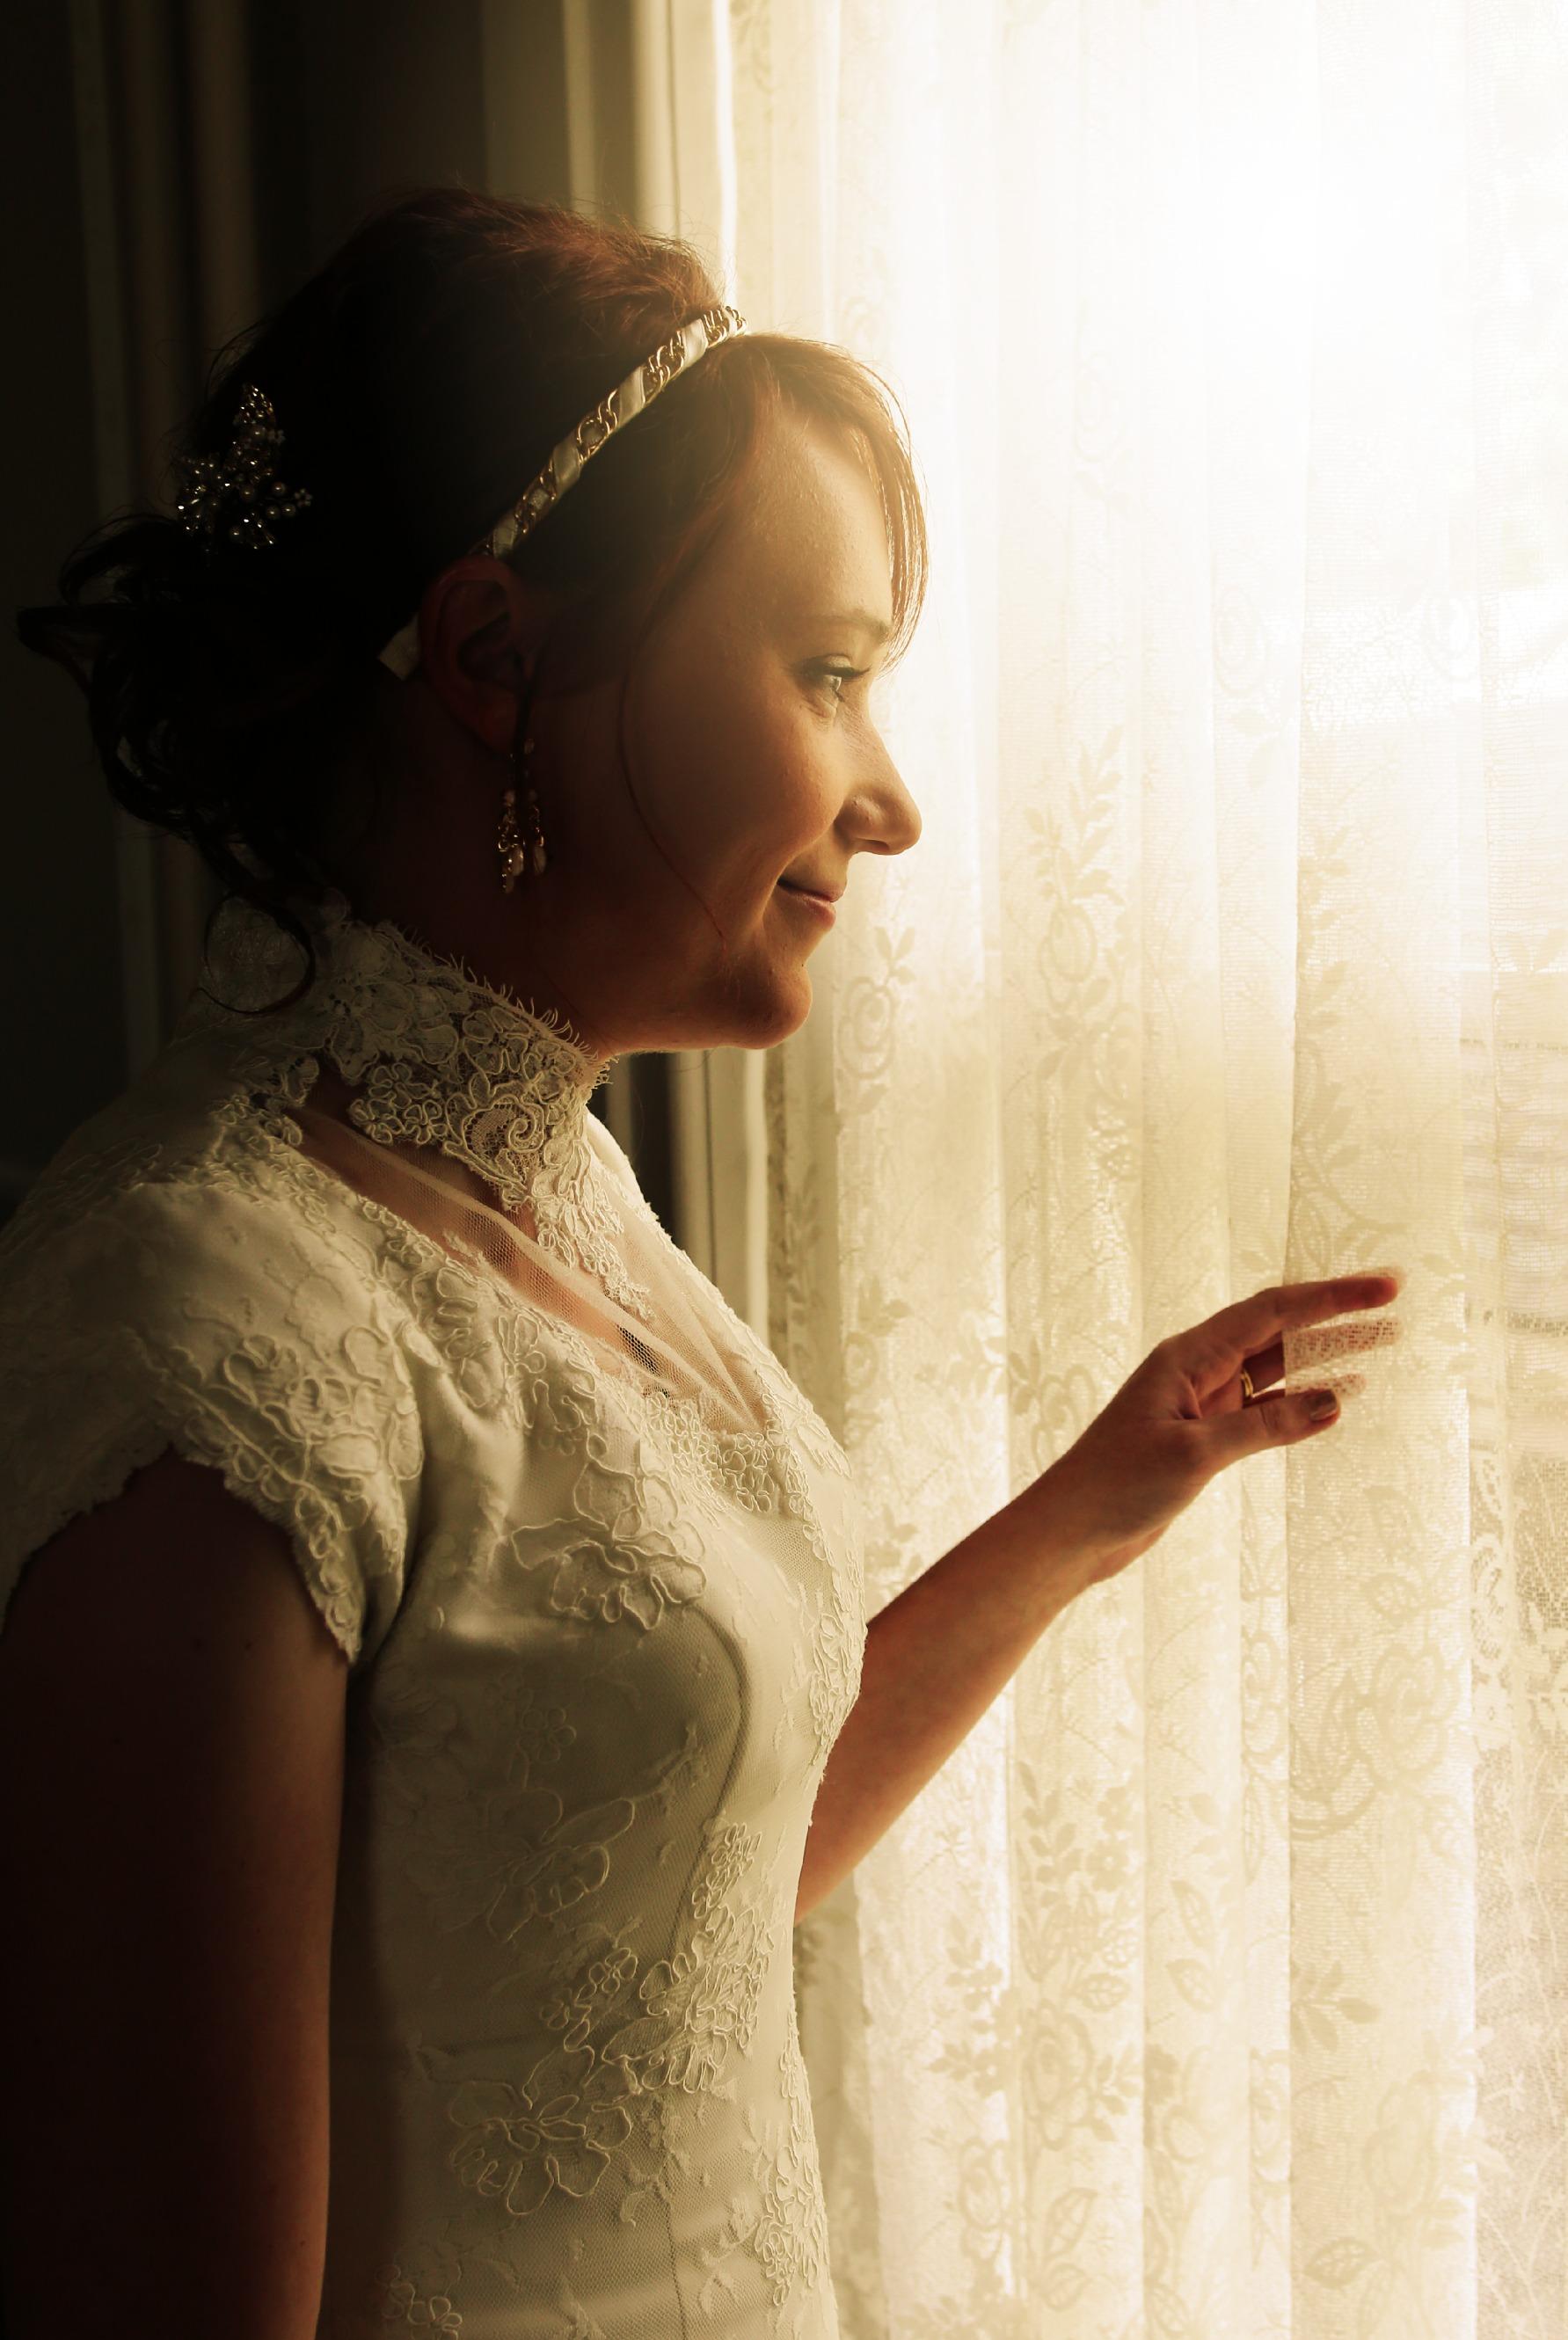 Bountiful Artistic wedding Bridal photography